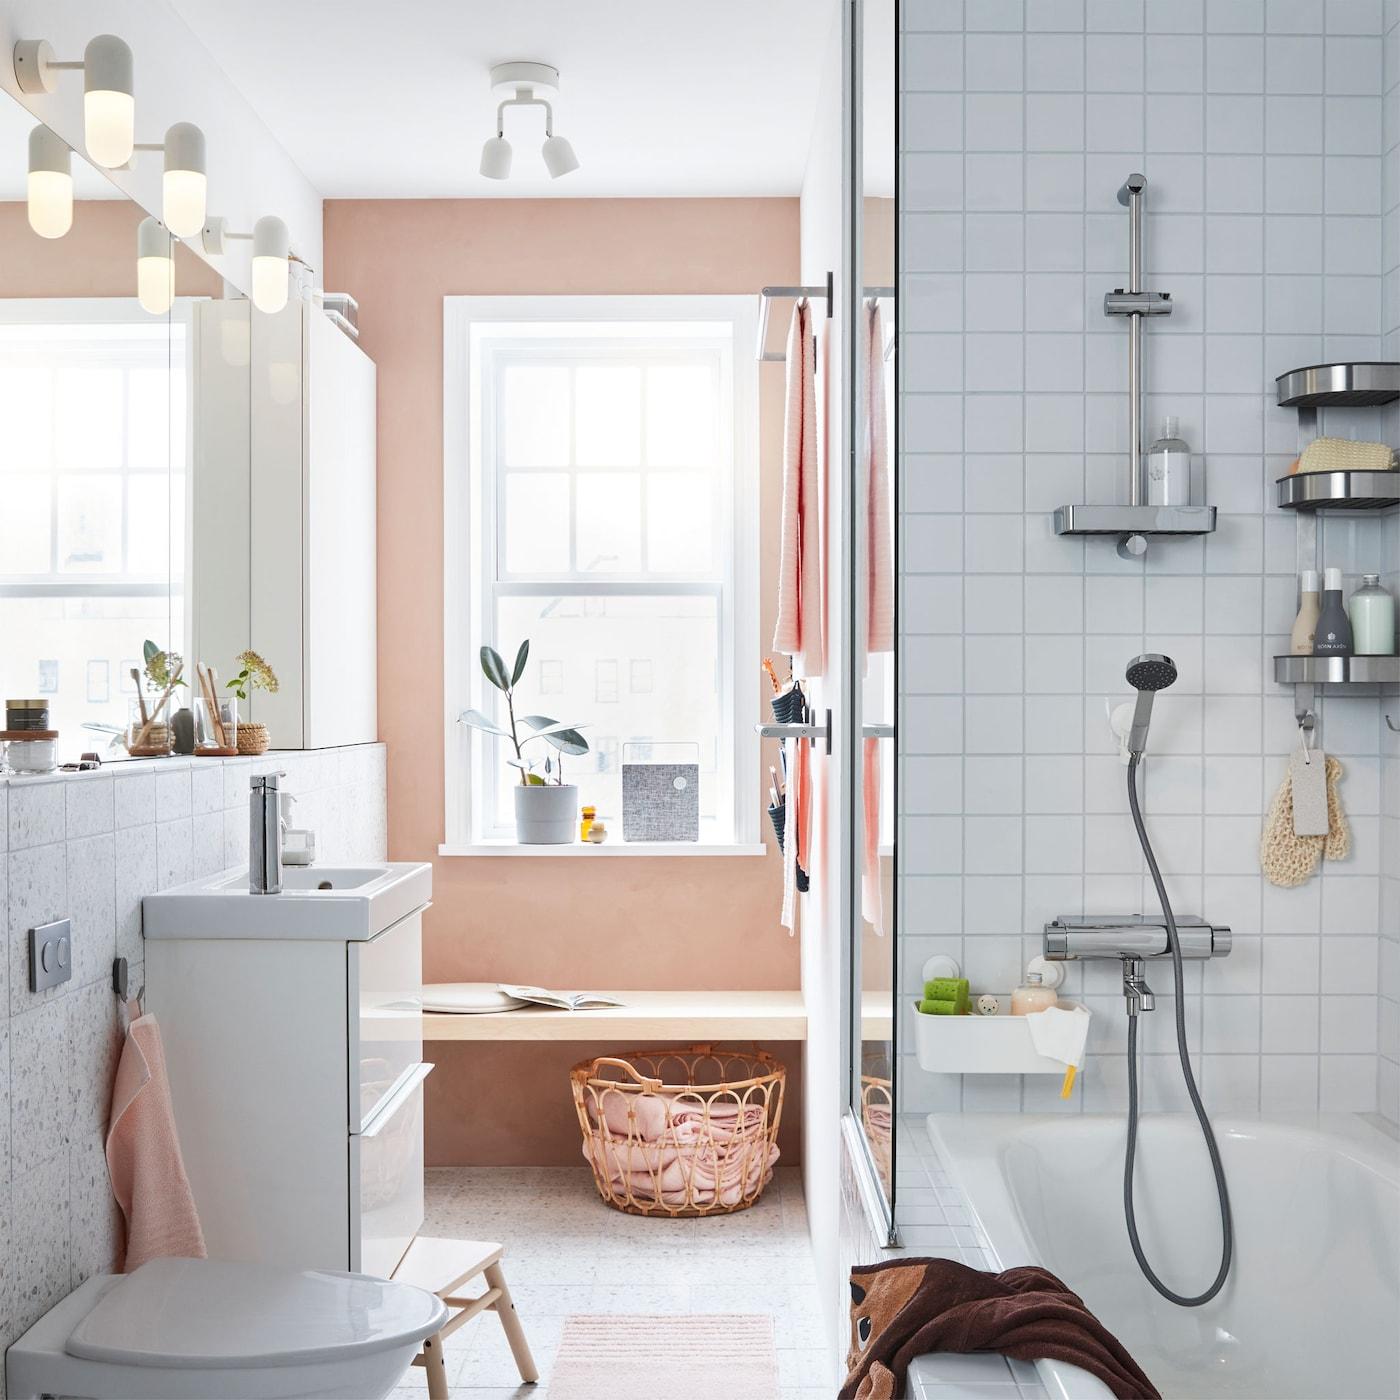 Bathroom furniture inspiration  IKEA Thailand - IKEA